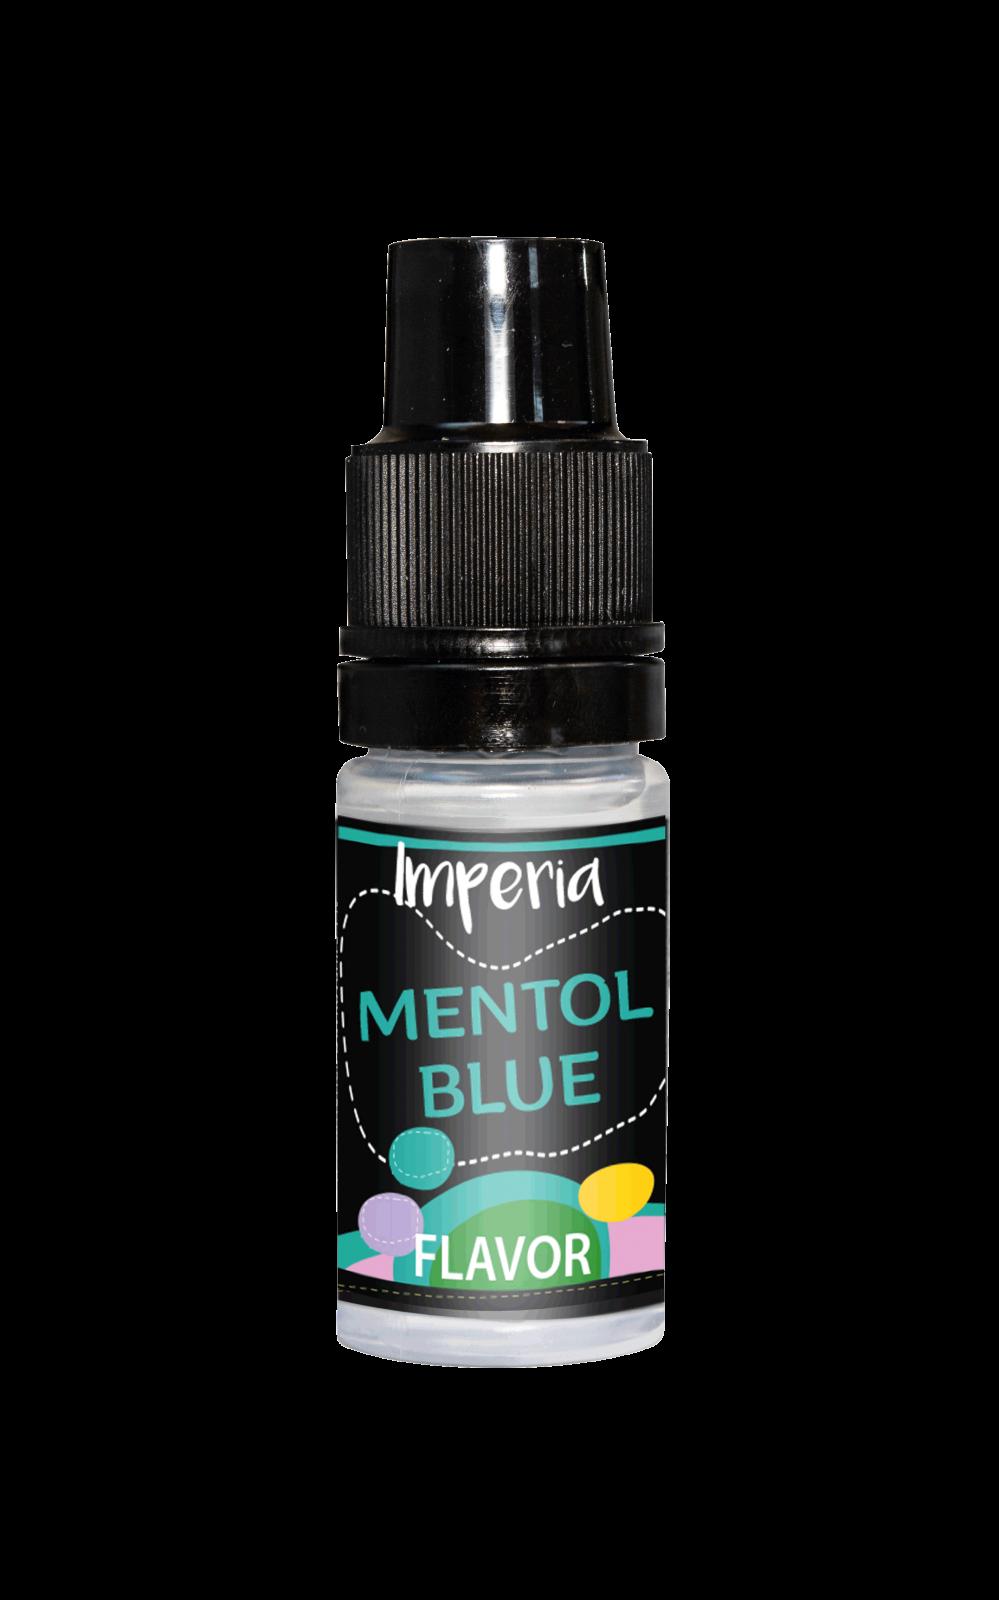 MENTHOL BLUE - Aroma Imperia Black Label Boudoir Samadhi s.r.o.